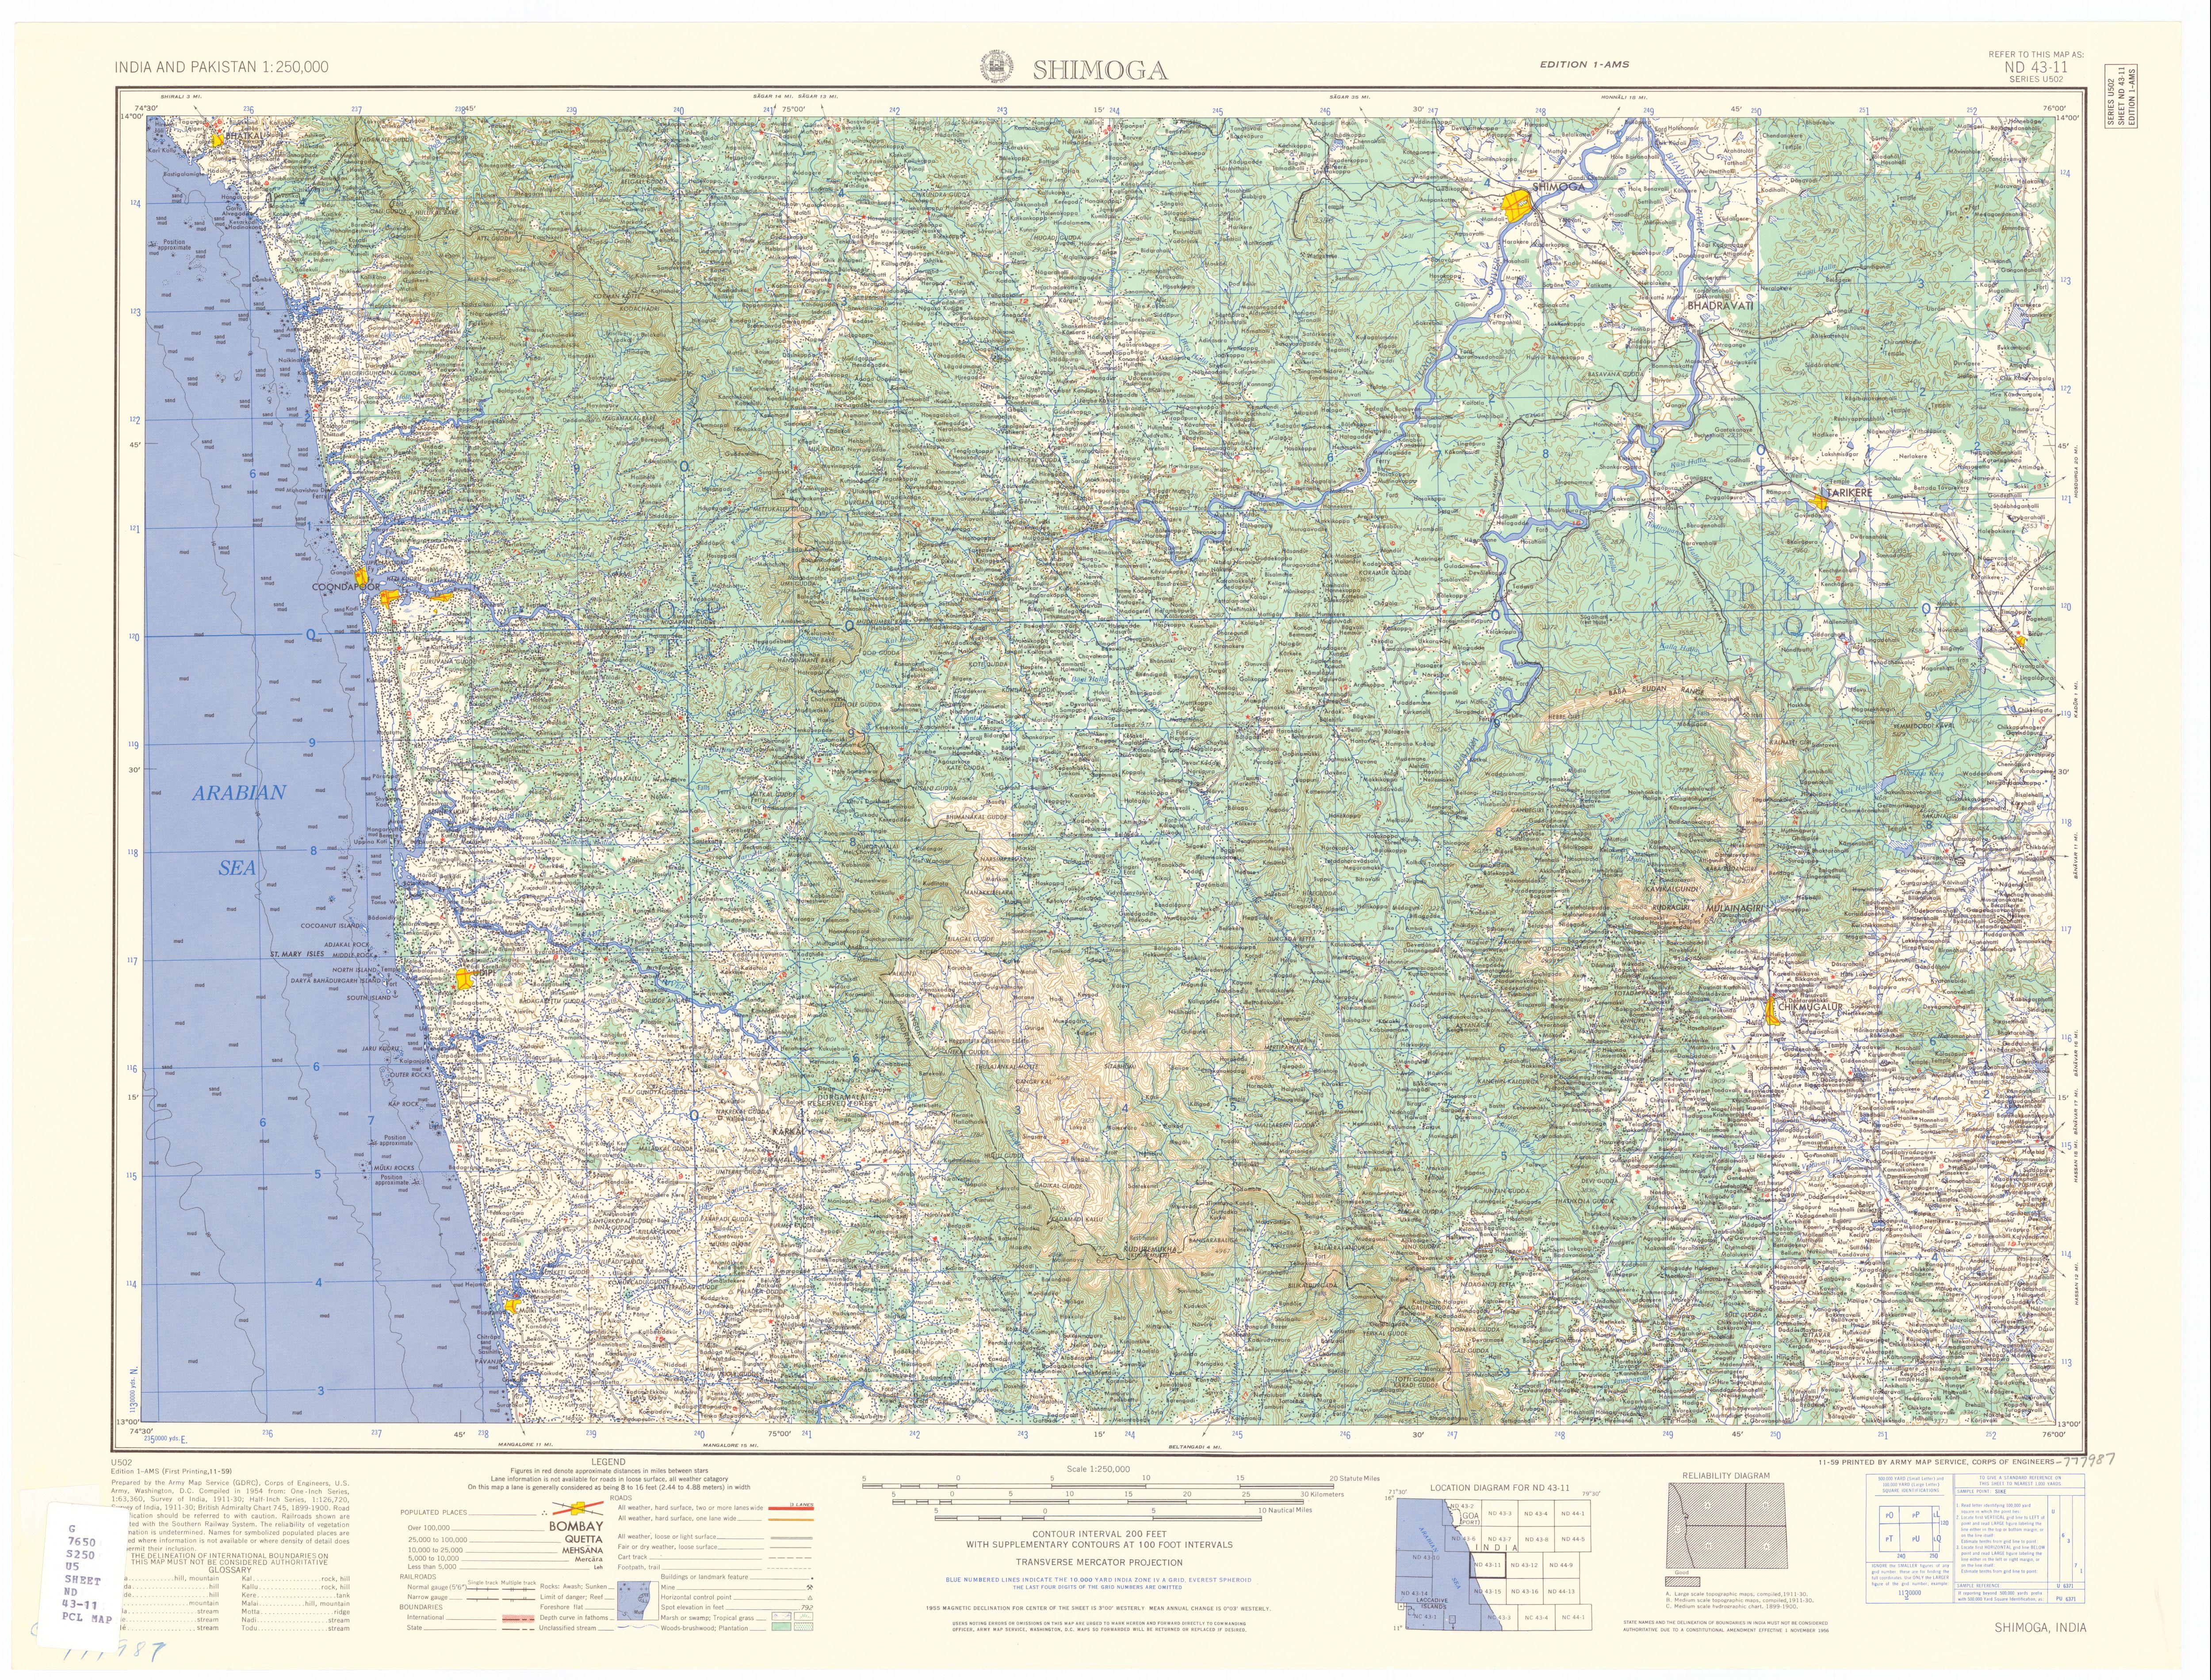 Shimoga India  City new picture : Description Map India and Pakistan 1 250,000 Tile ND 43 11 Shimoga